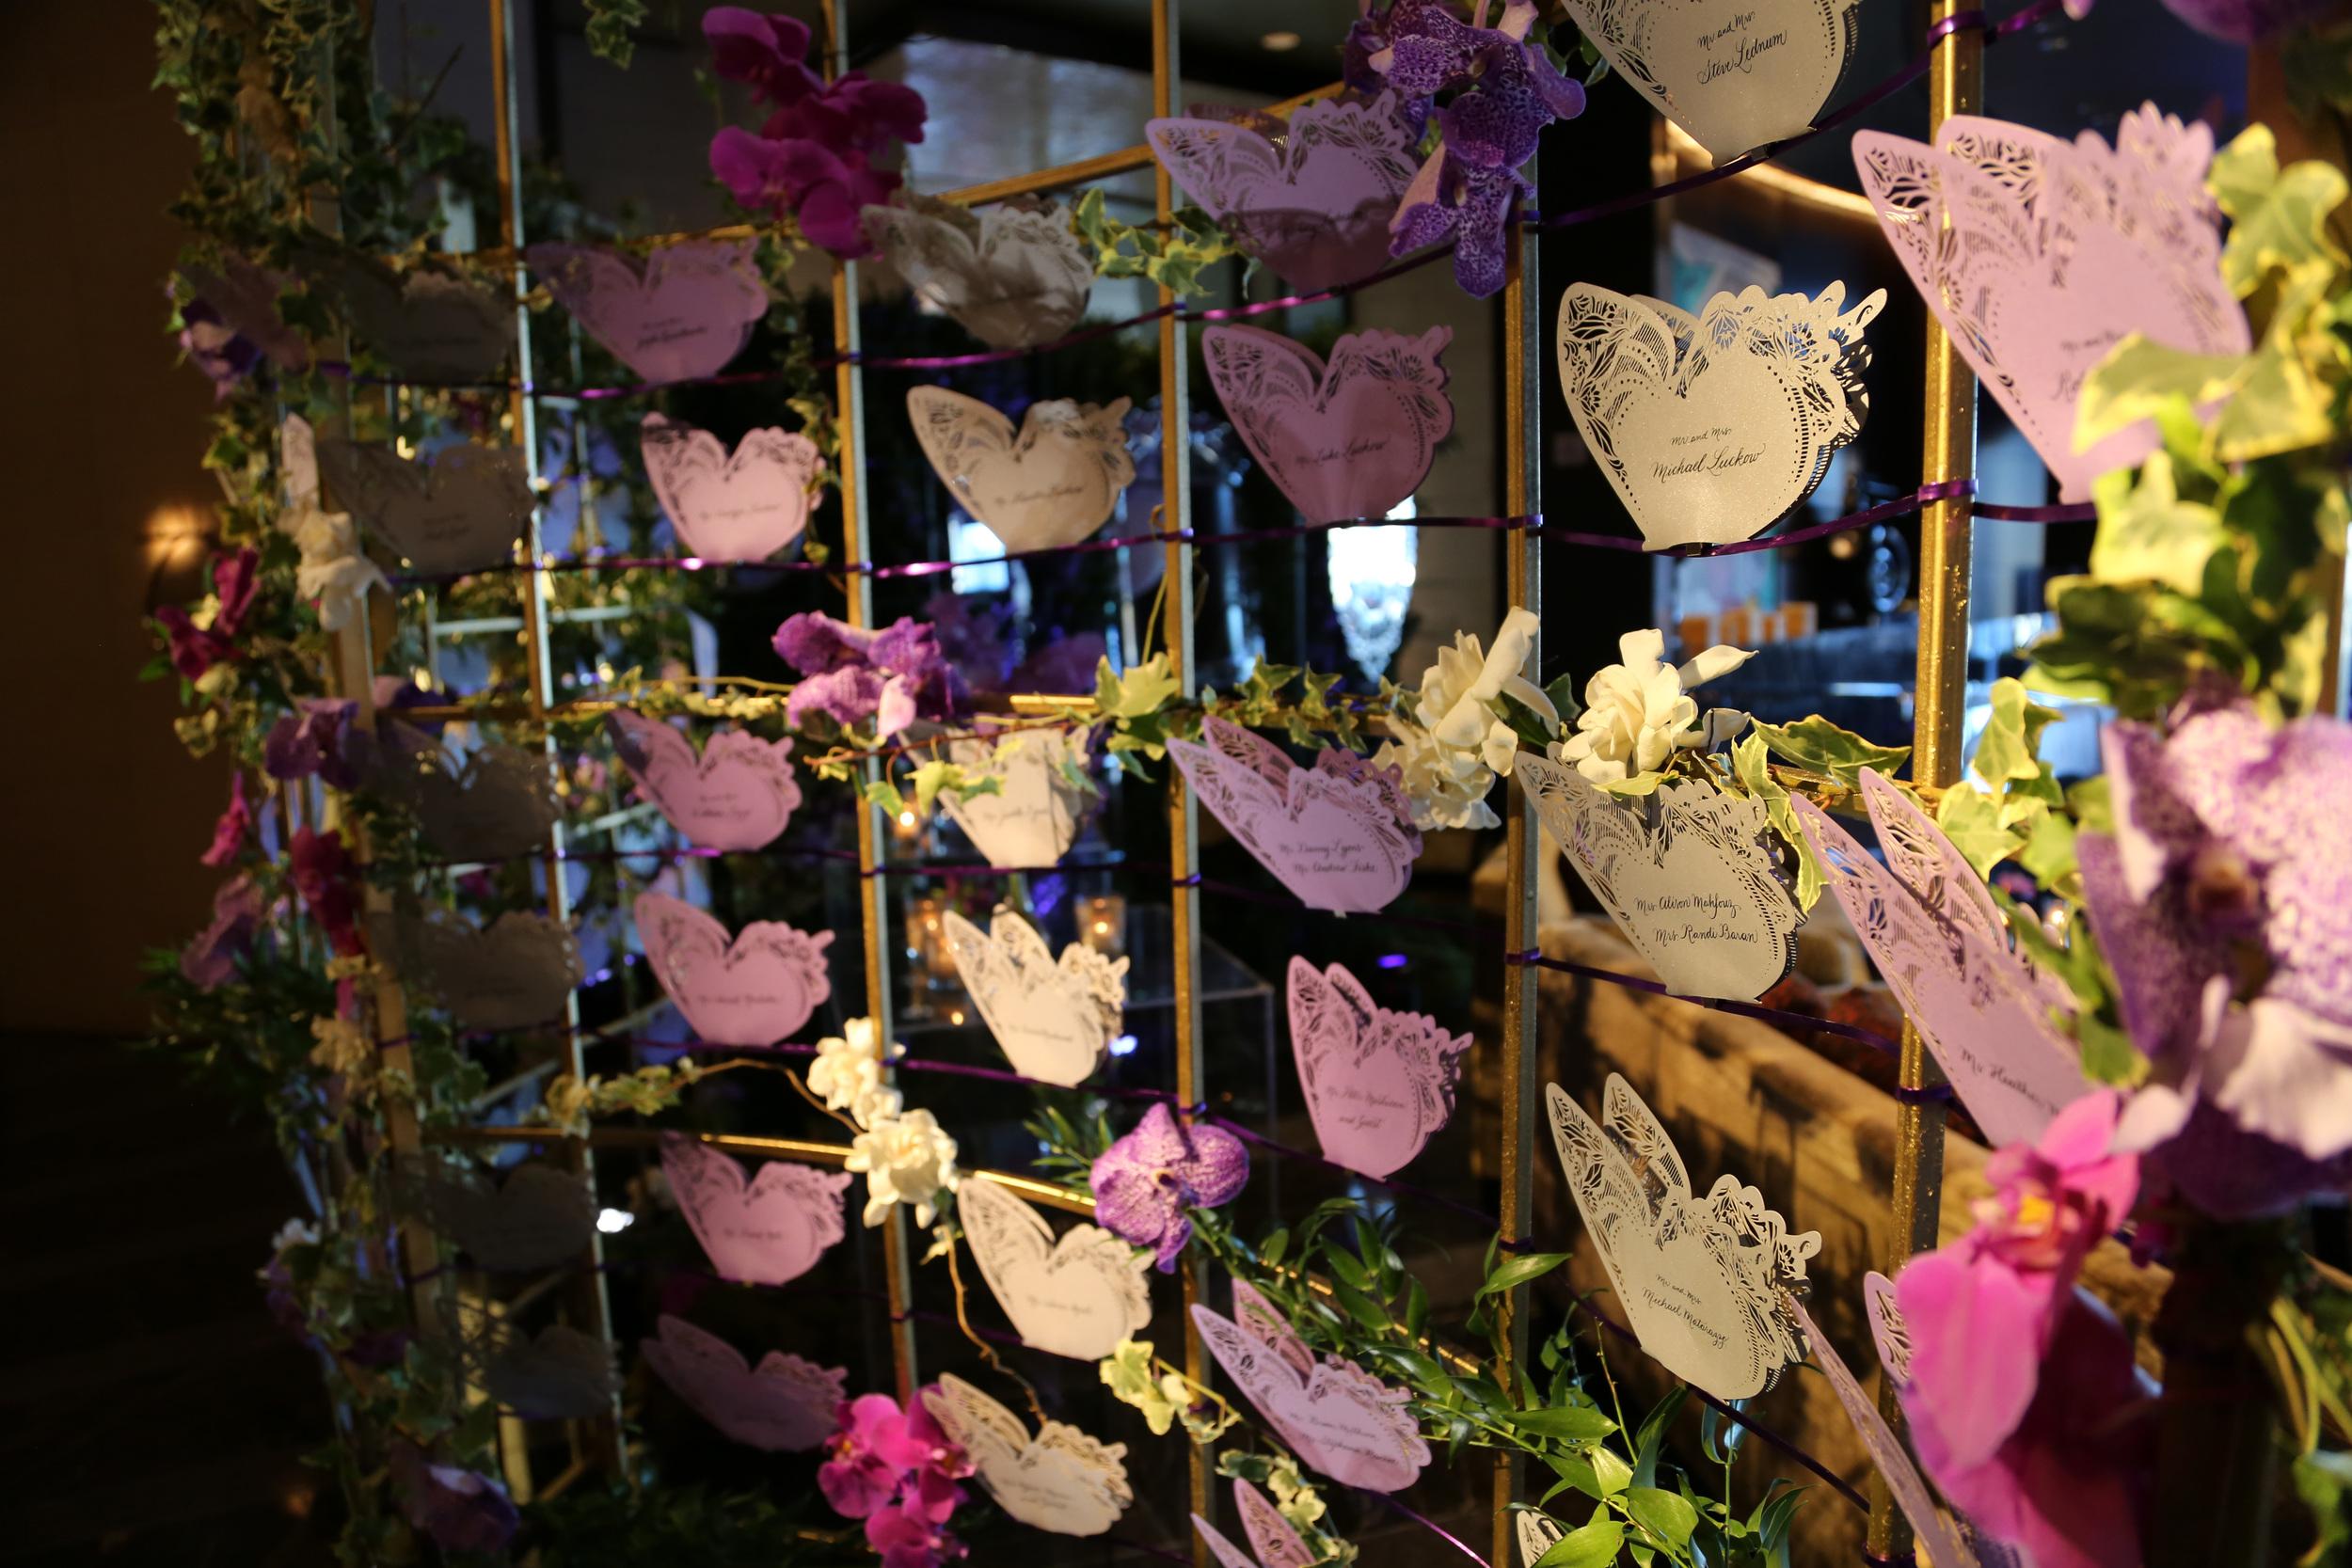 mandarin_oriental_new_york_city_branding_inspiration_lavender_silver_wedding_floral_purple_v284_19.jpg